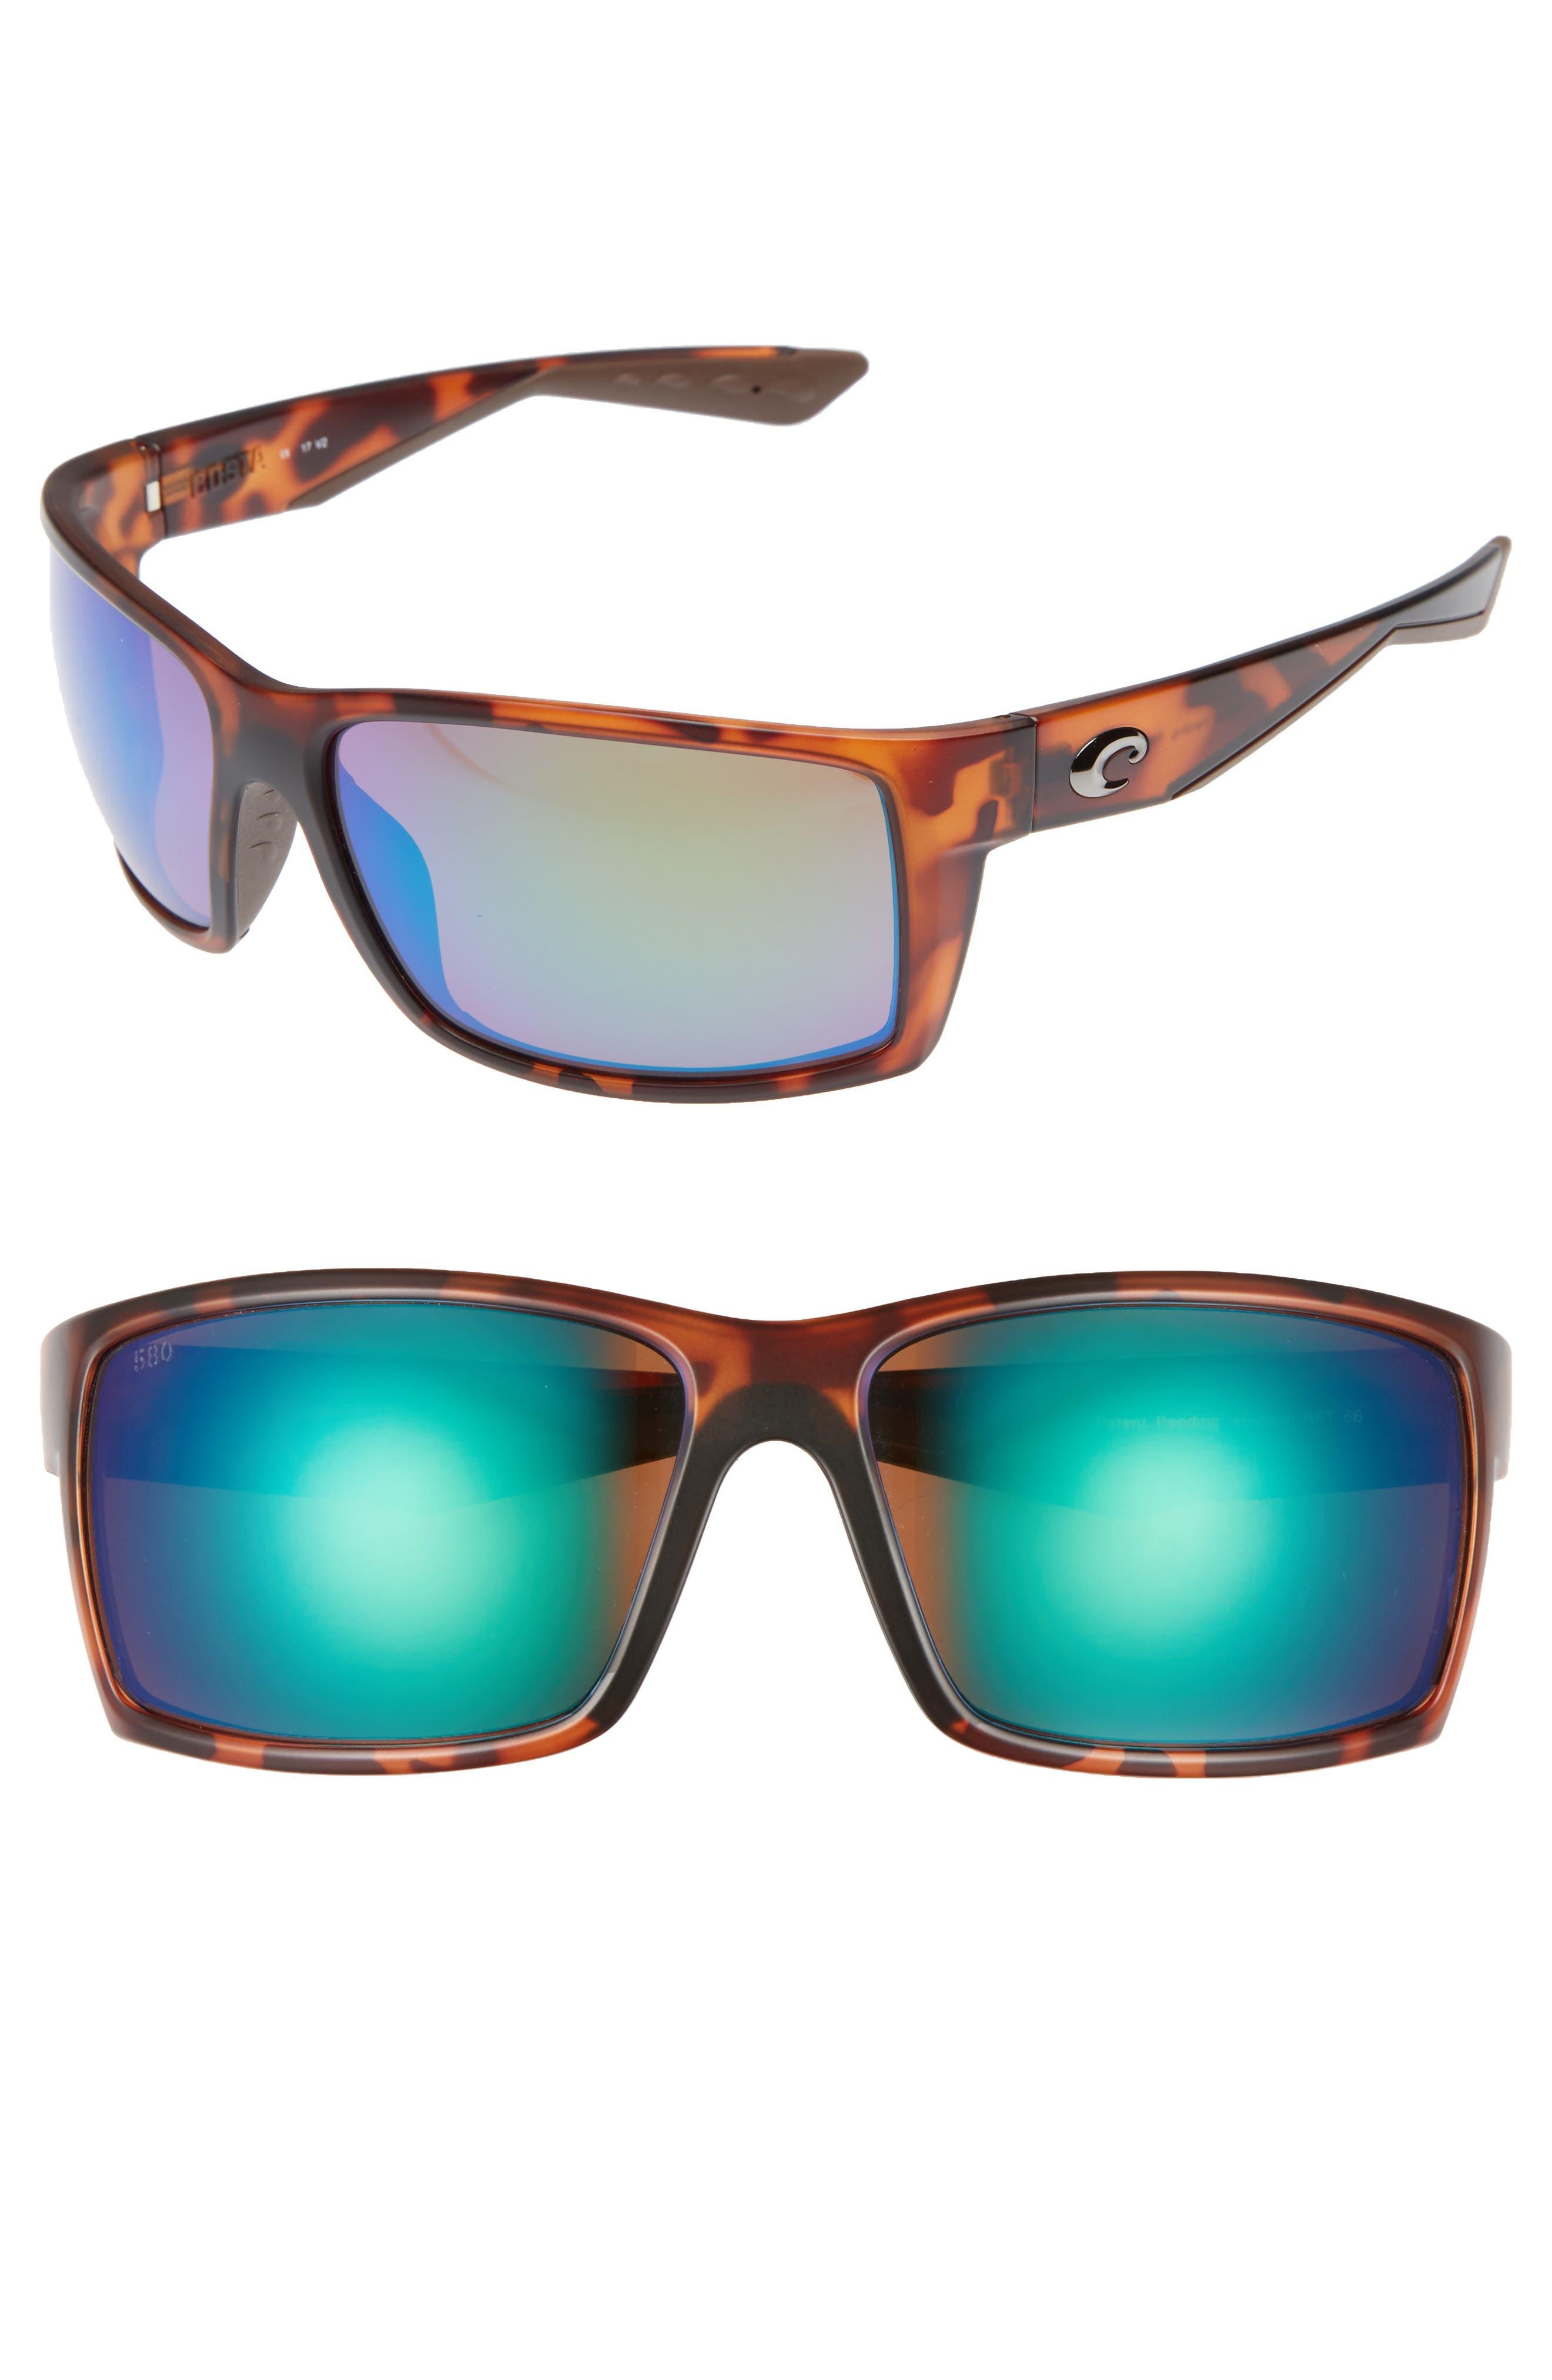 Reefton 65mm Polarized Sunglasses,                         Main,                         color, Tortoise/ Green Mirror